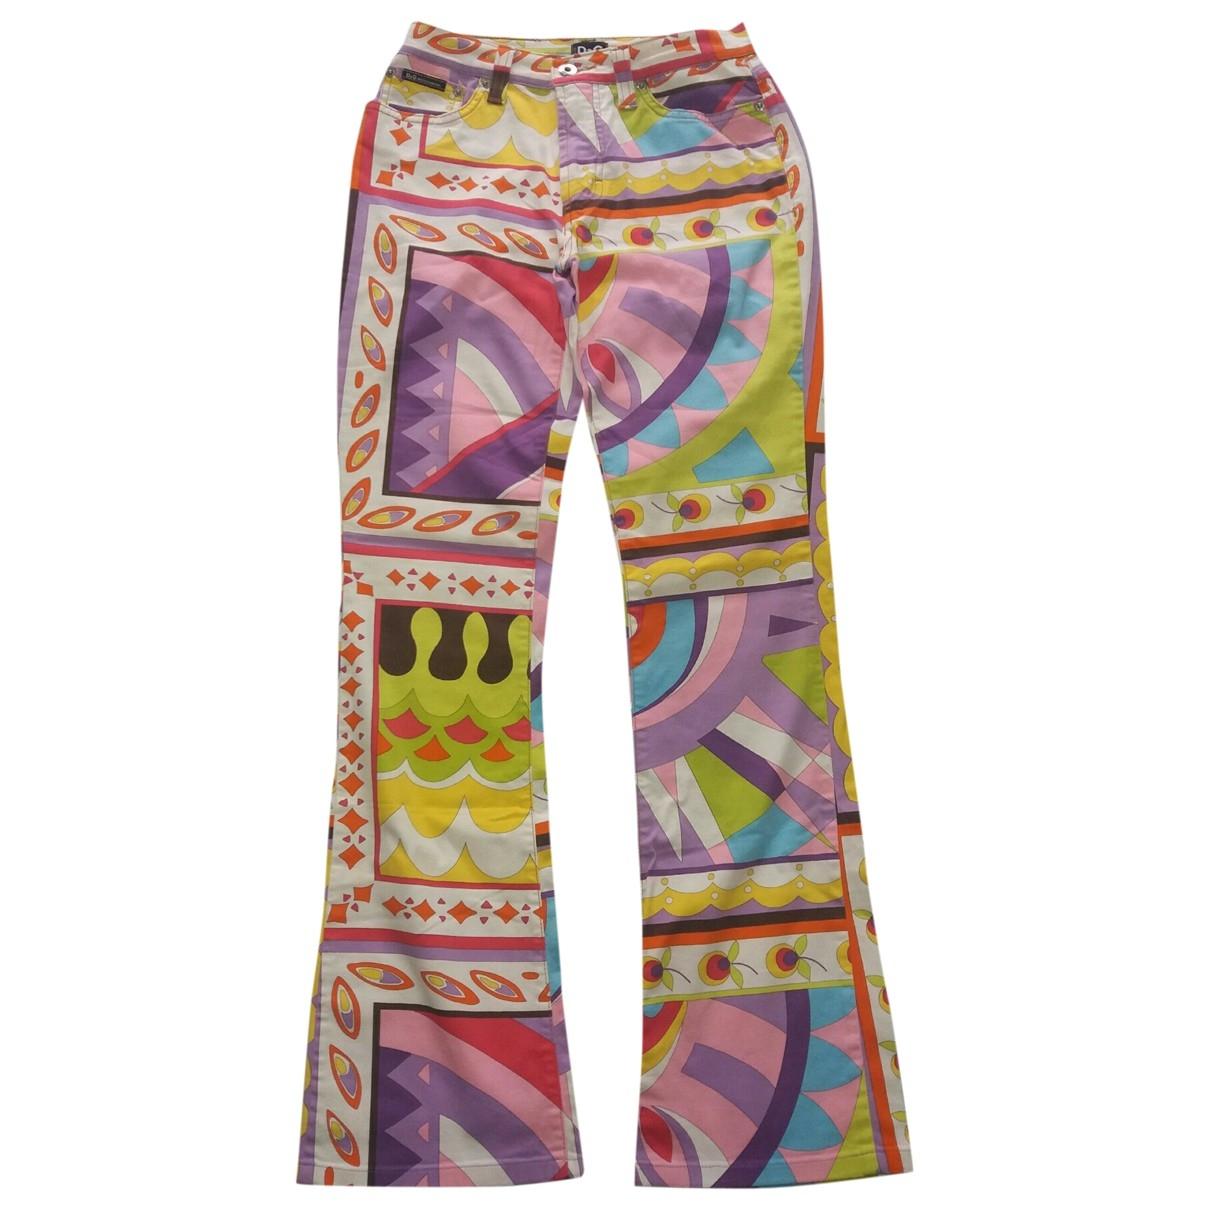 Pantalon en Algodon Multicolor D&g